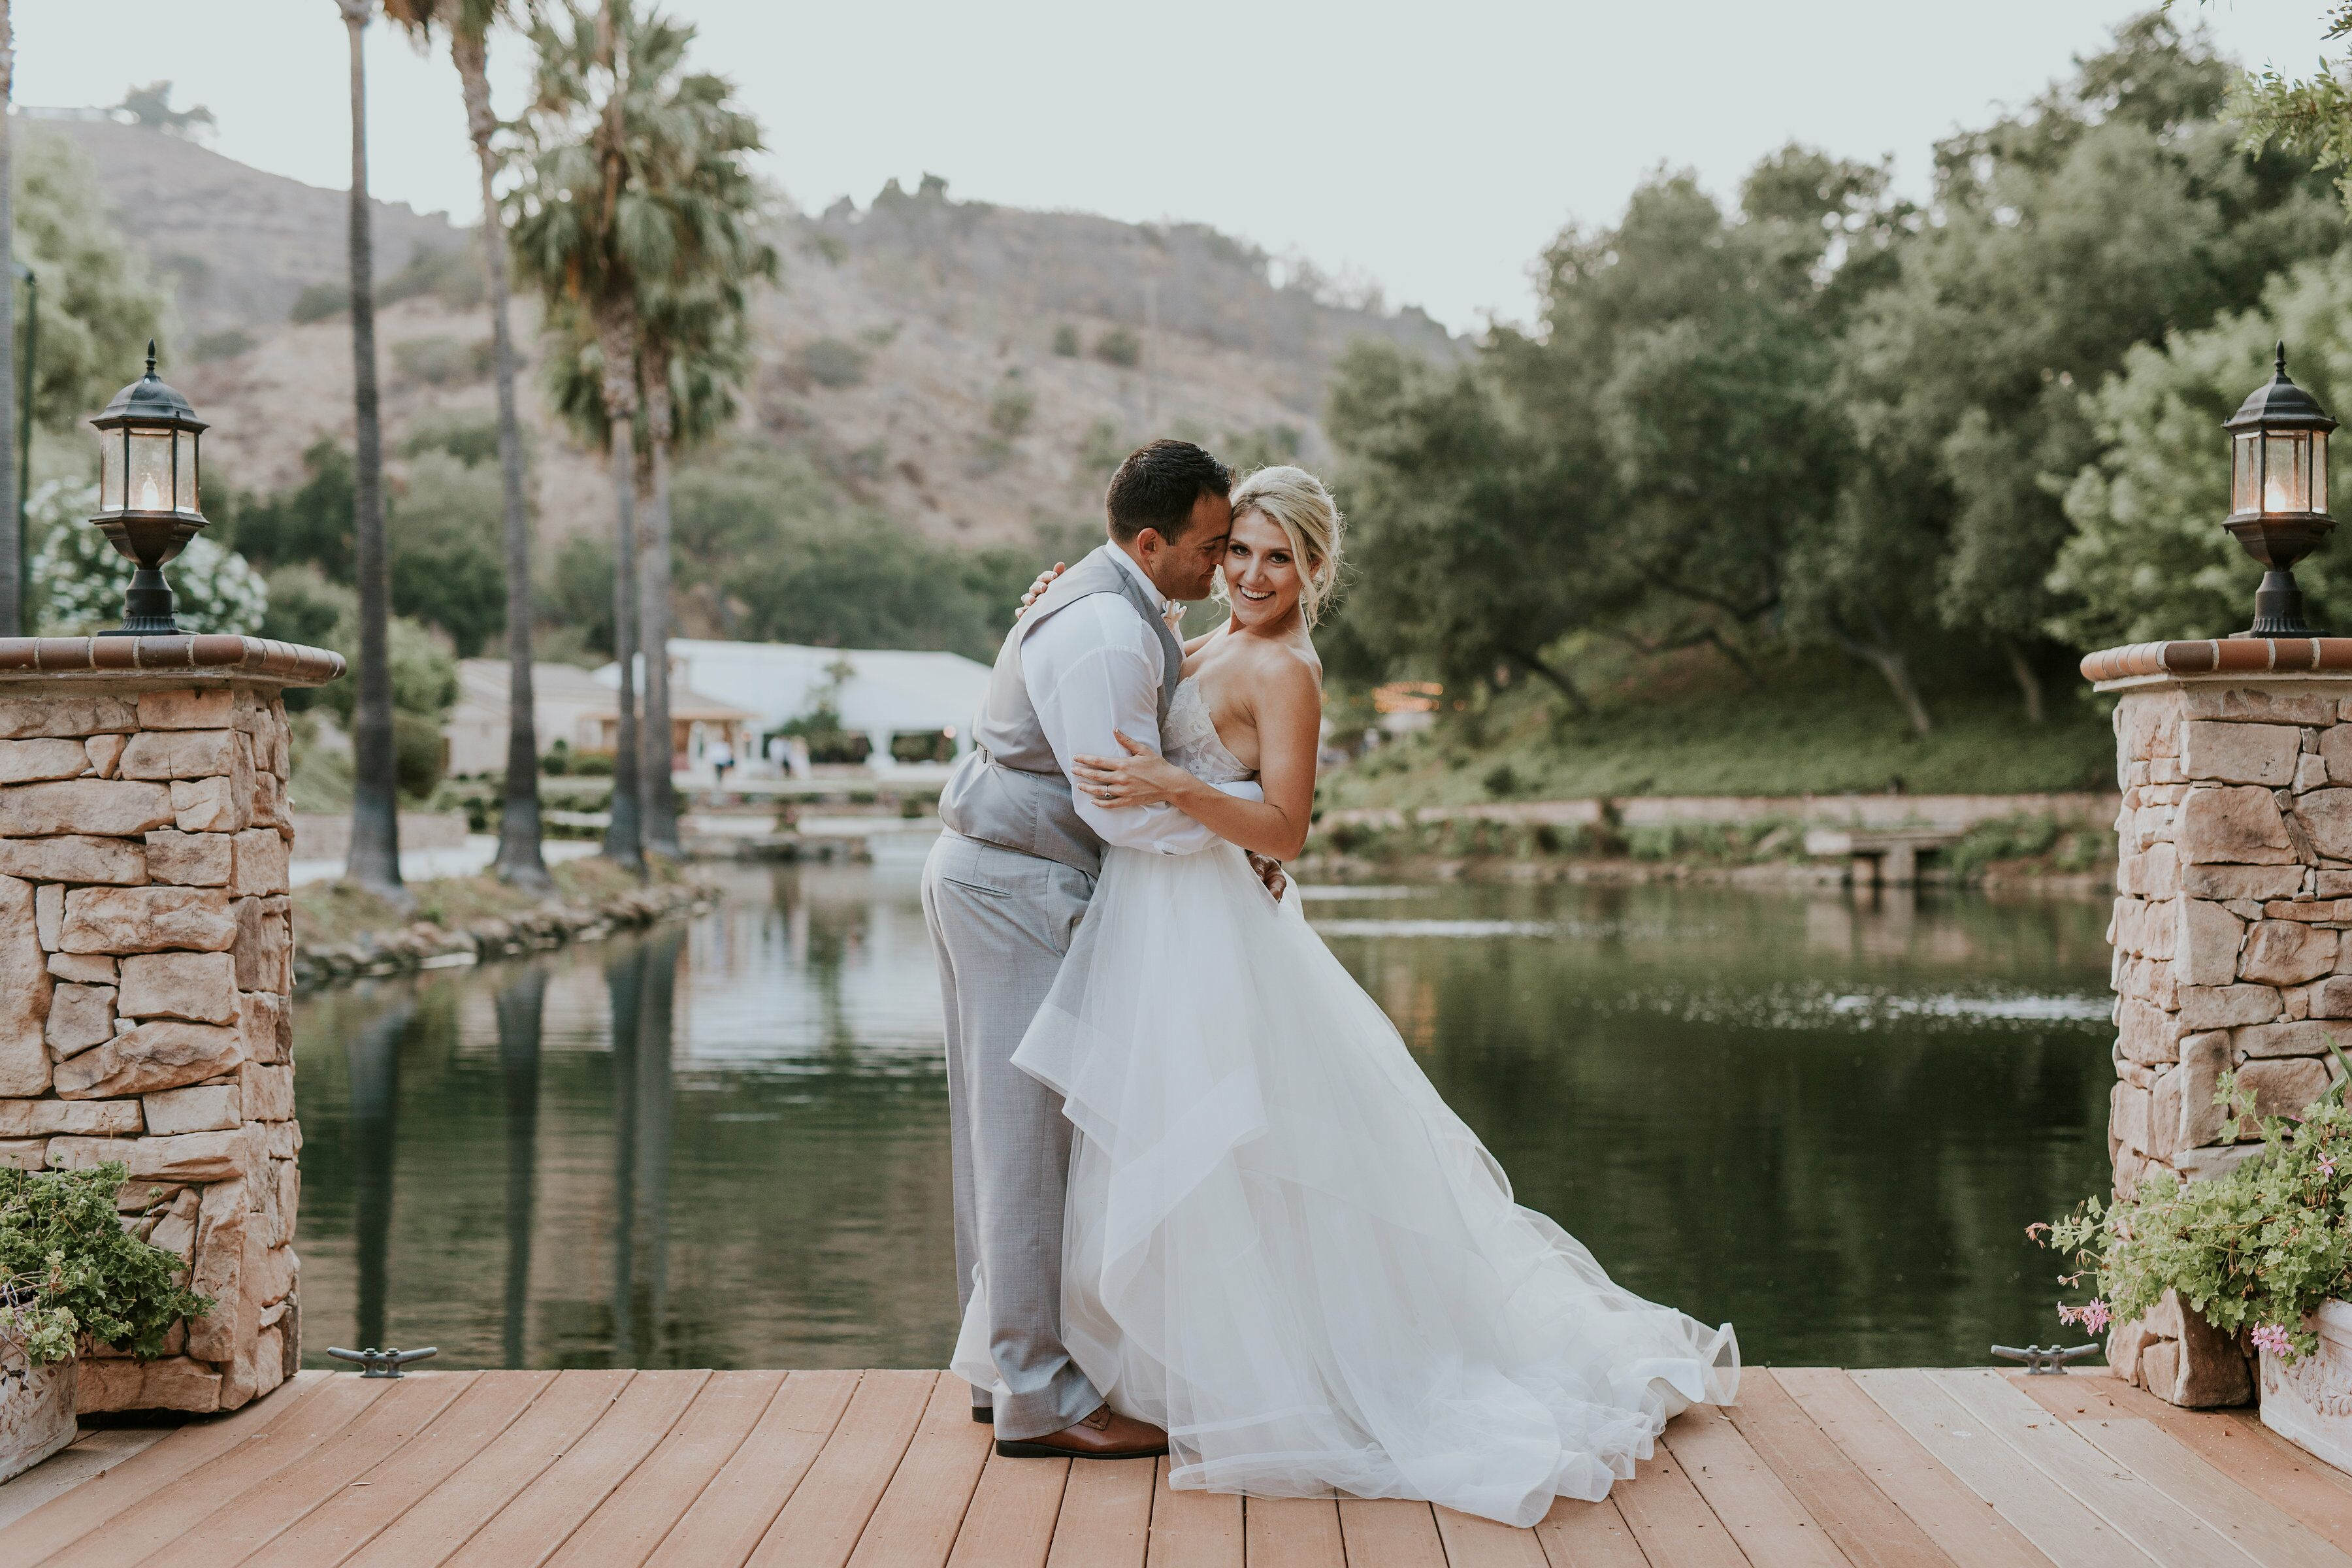 Los Willows Private Wedding Estate